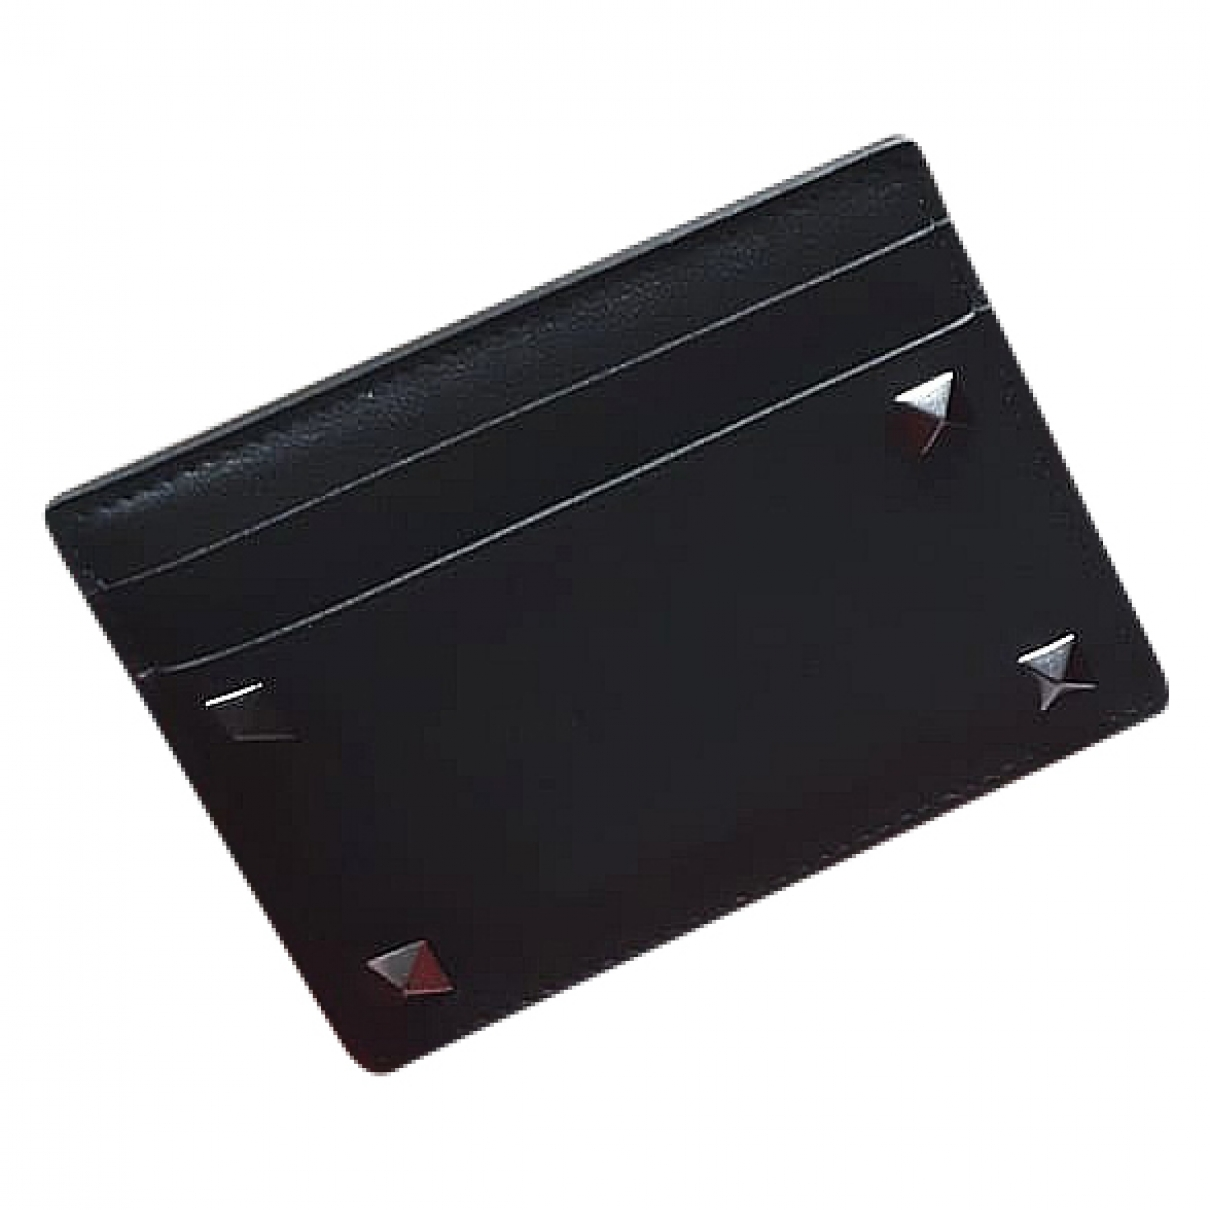 Valentino Garavani \N Kleinlederwaren in  Schwarz Leder